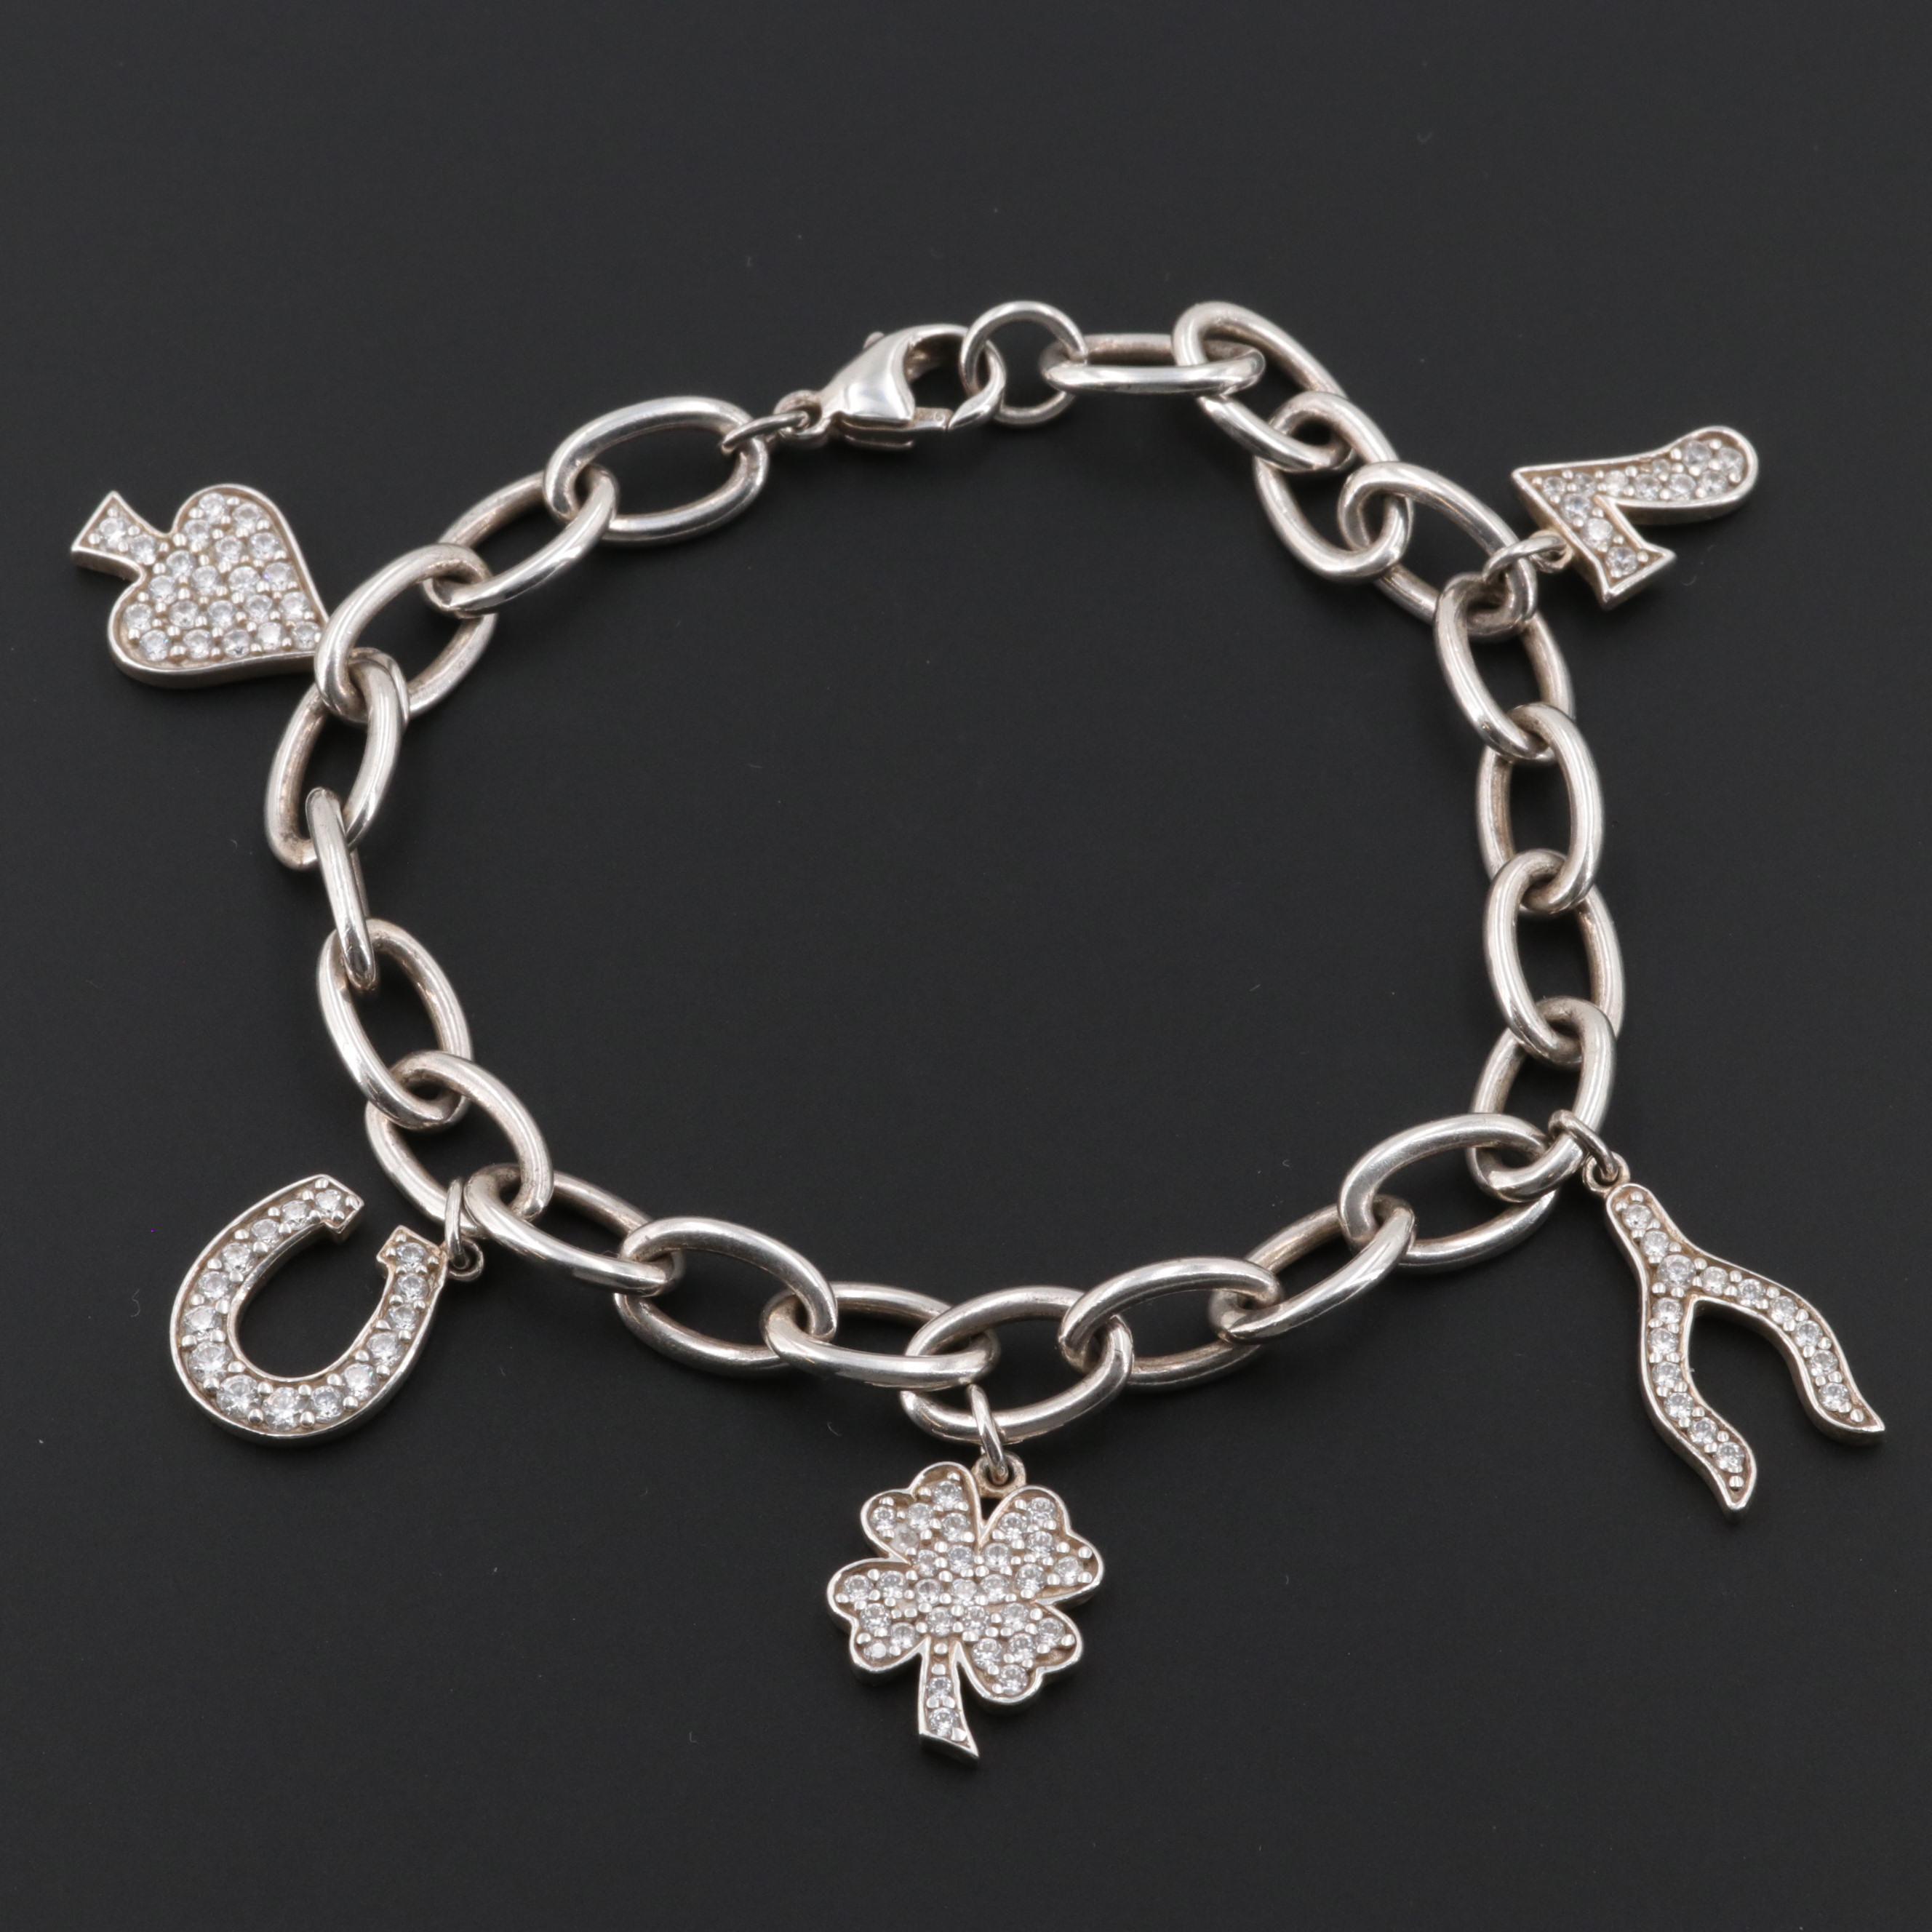 Sterling Silver Cubic Zirconia Good Luck Charm Bracelet